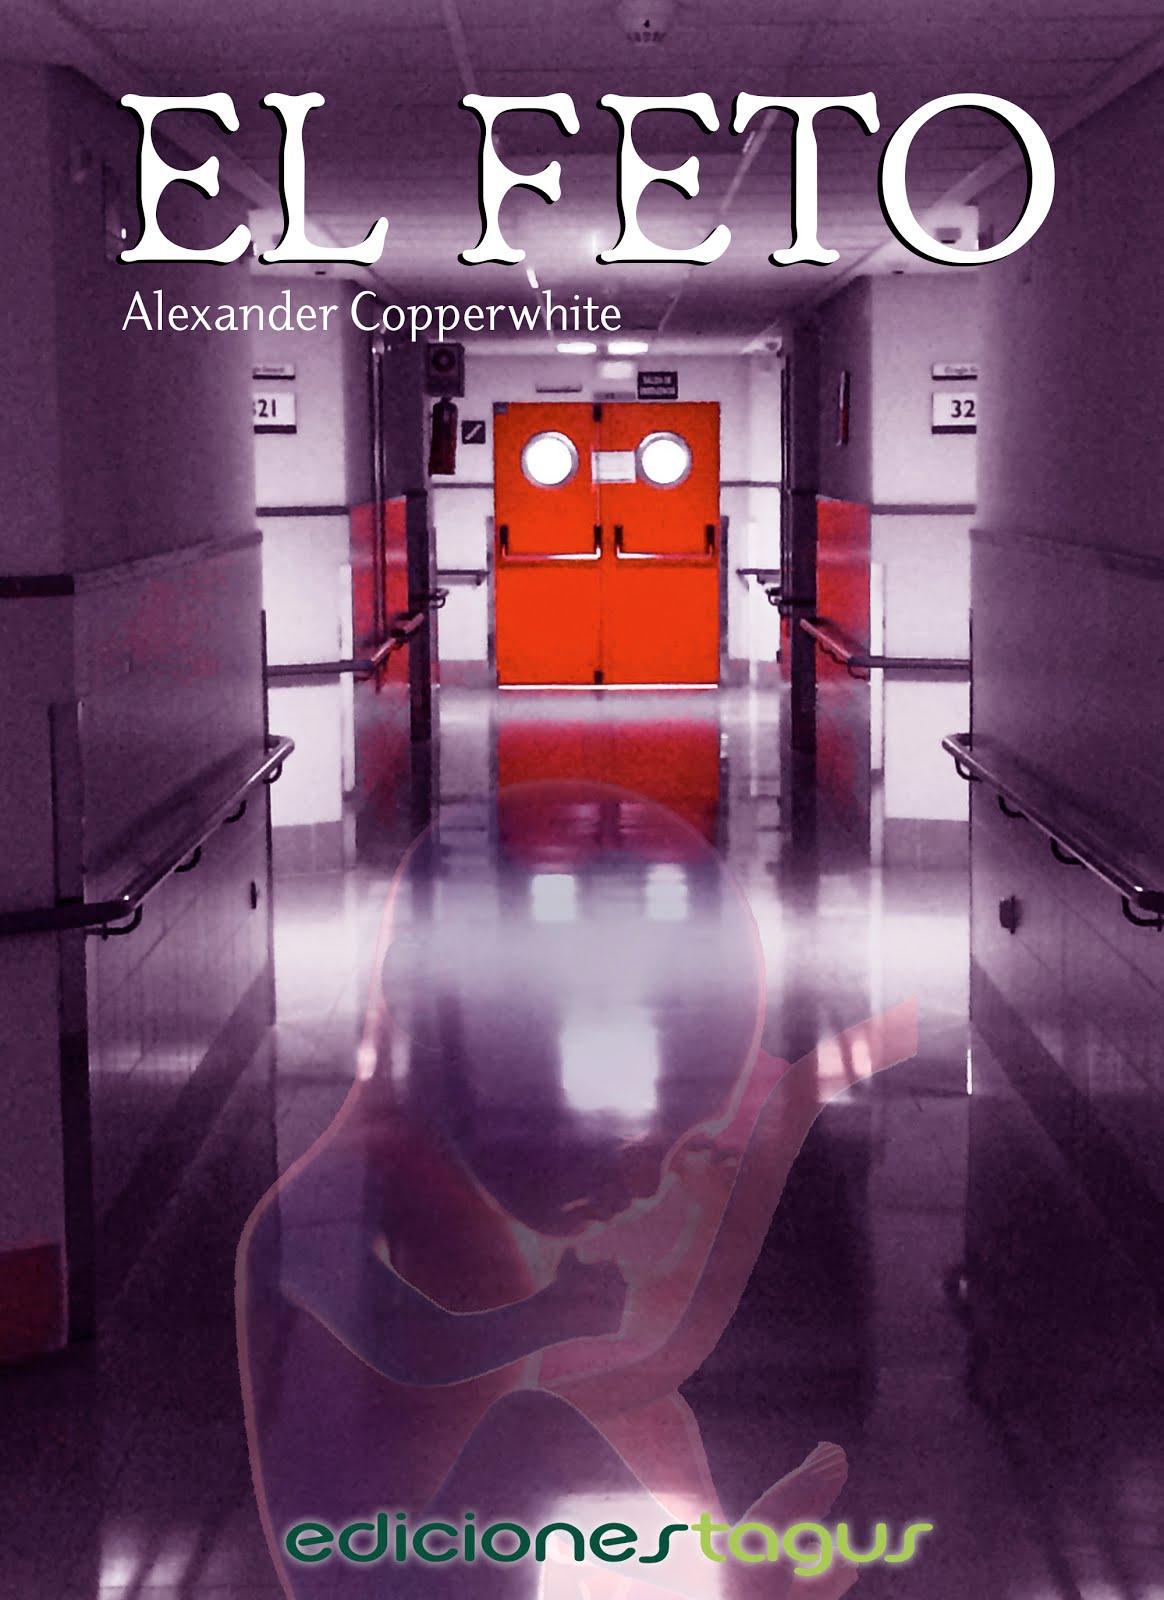 EL FETO La última novela de Alexander Copperwhite